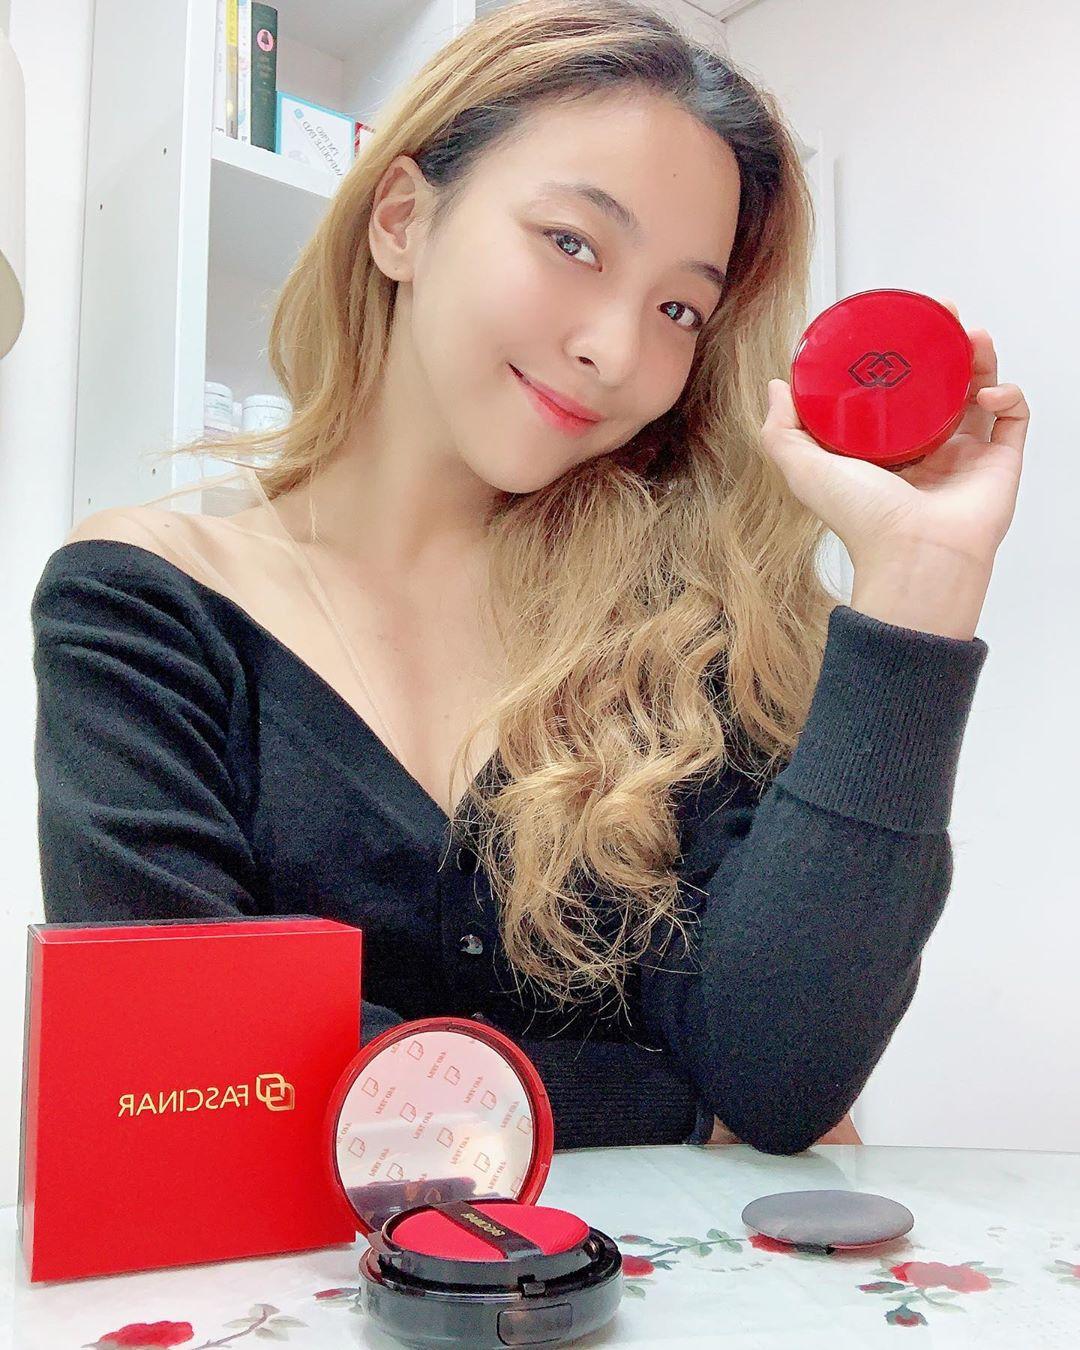 luna instagram makeup sell 2